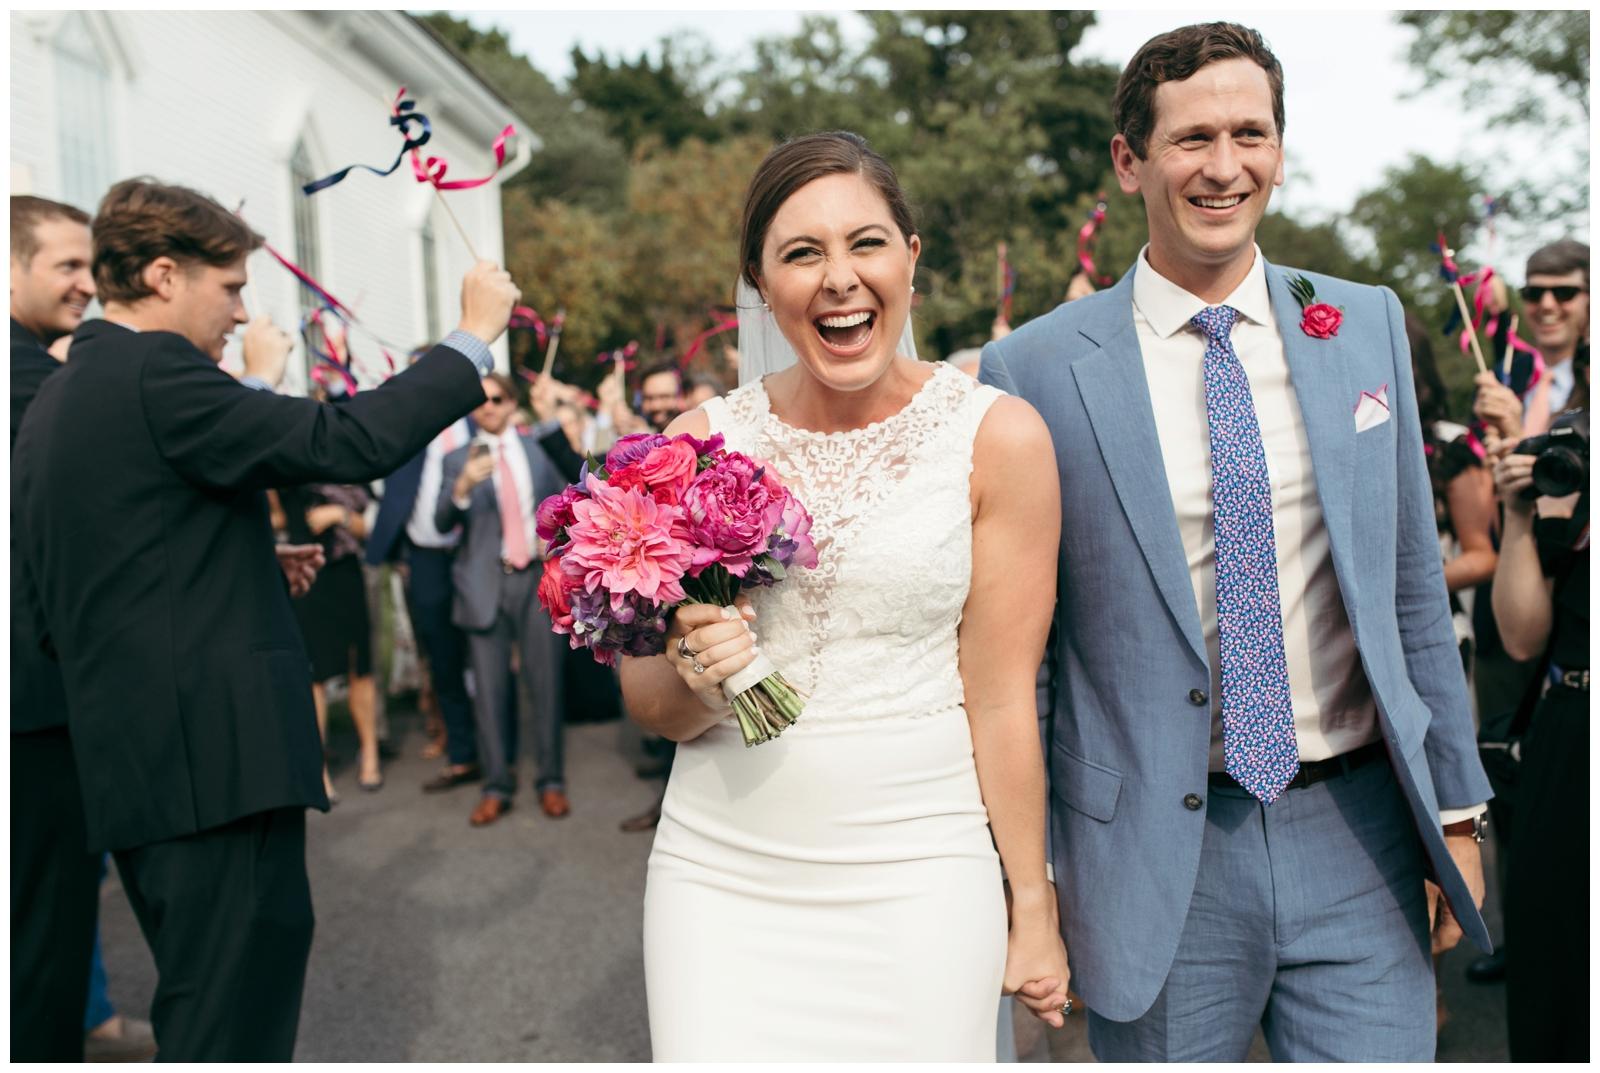 Bailey-Q-Photo-Backyard-Wedding-South-Shore-Boston-Wedding-Photographer-057.jpg